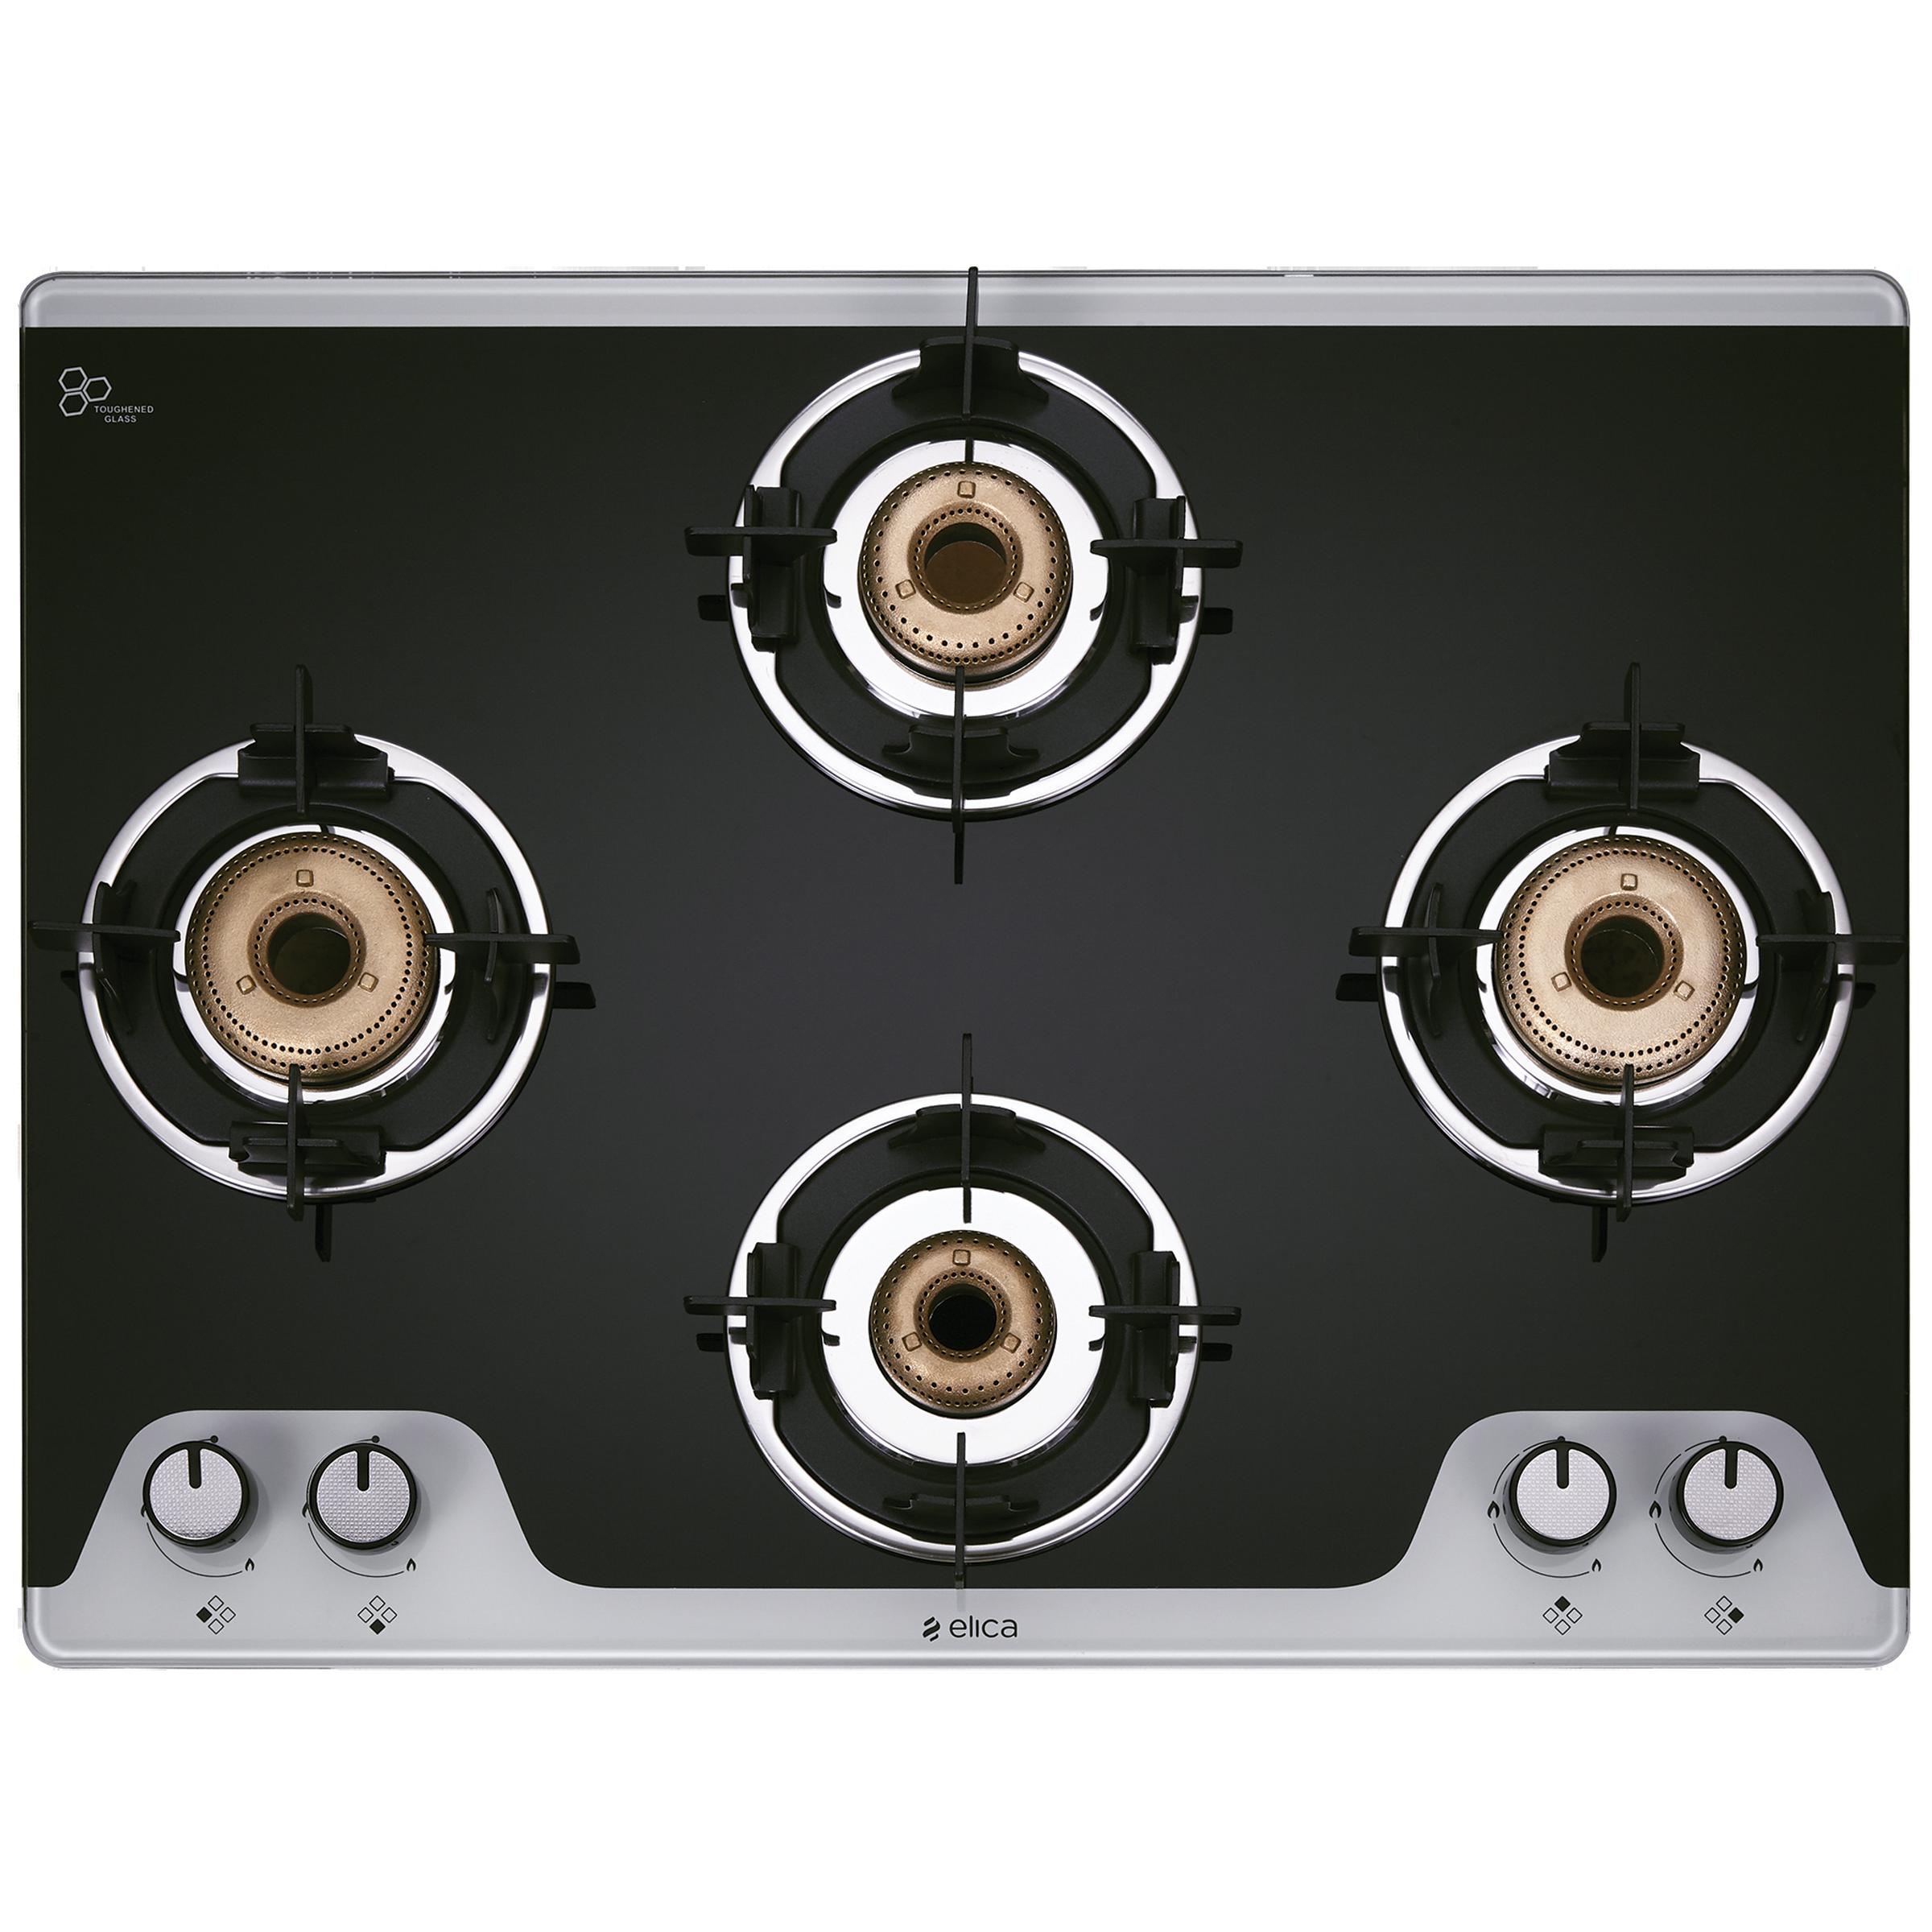 Elica TKN Crown DT AI 4 Burner Dual Tone Toughened Glass Gas Stove (Bakelite Knobs, 694 CT Vetro 2J, Black)